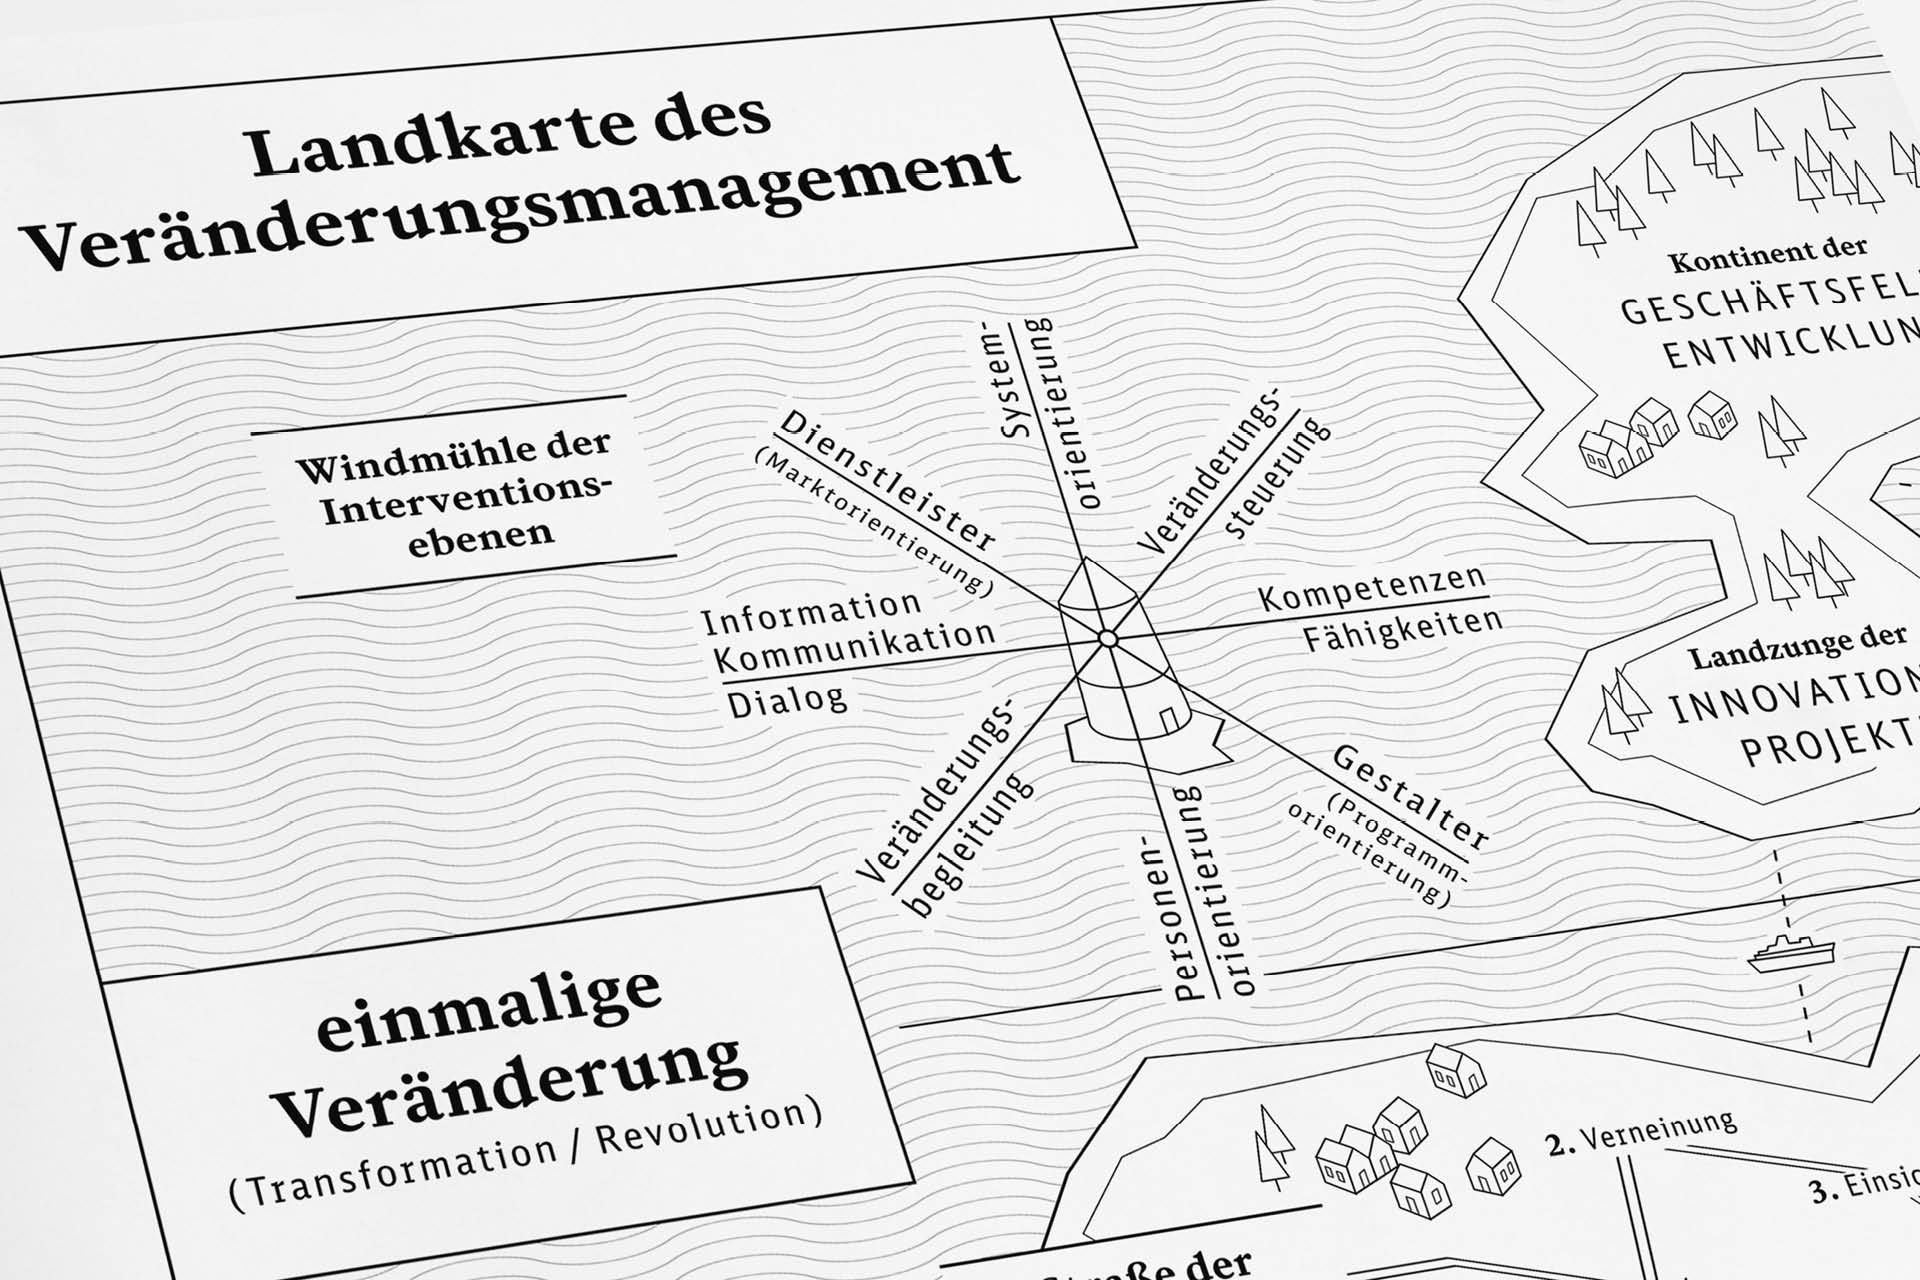 DB_Landkarte_